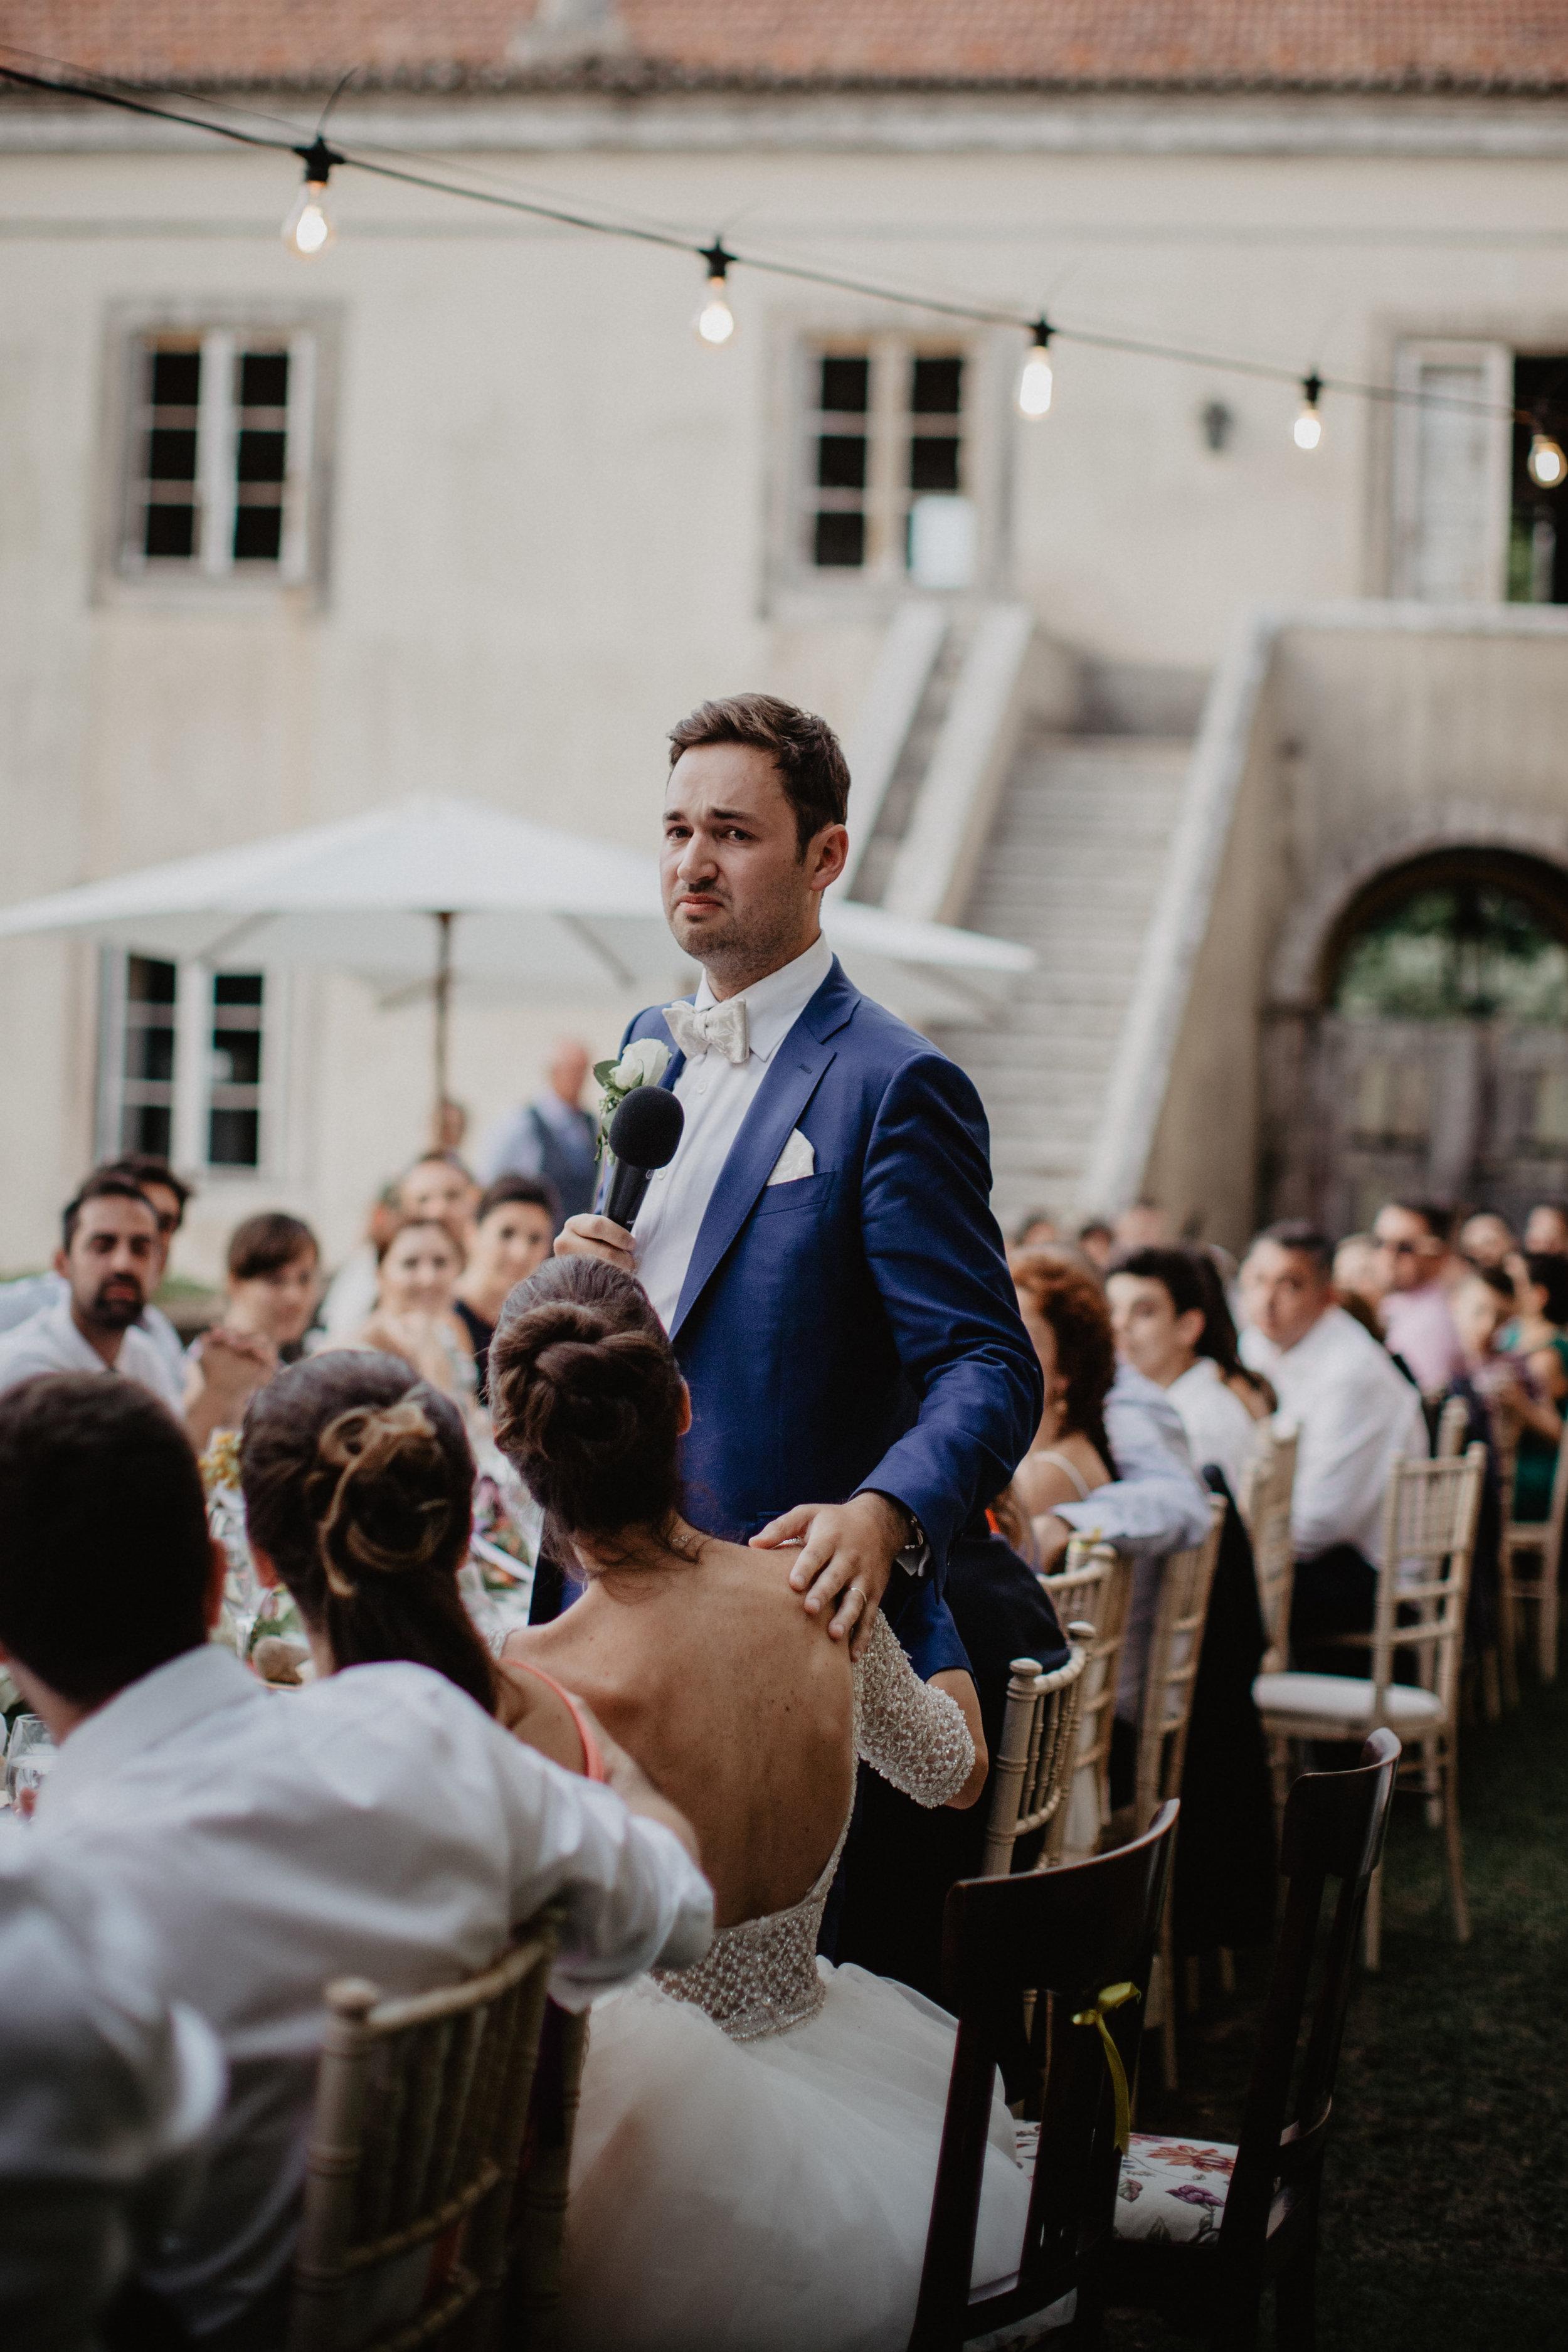 Lapela-photography-wedding-sintra-portugal-114.jpg